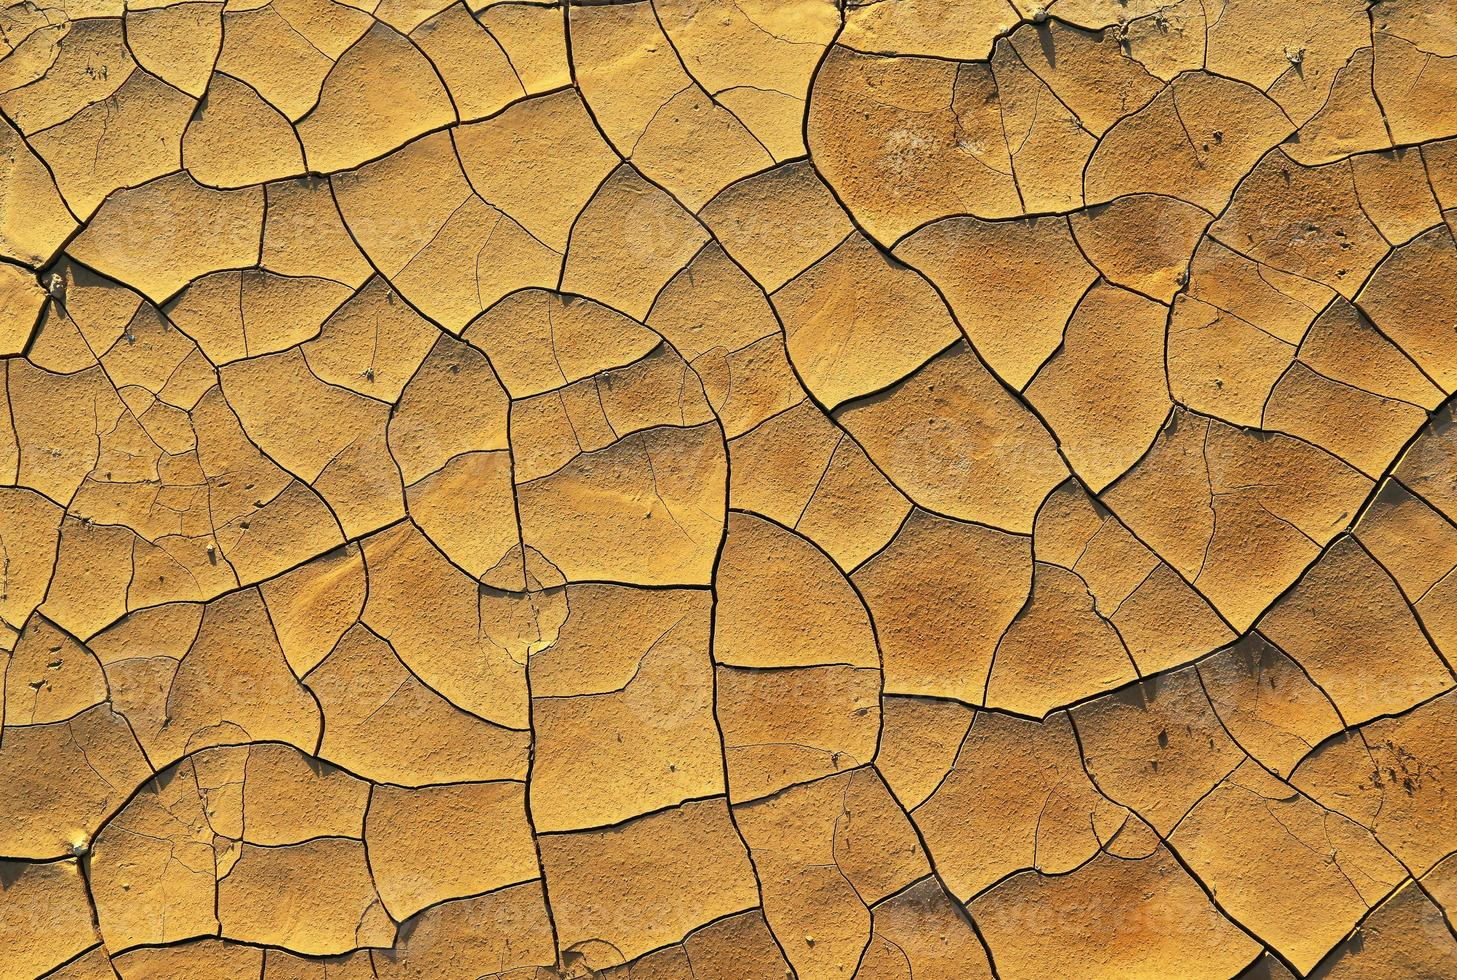 terra secca e screpolata foto